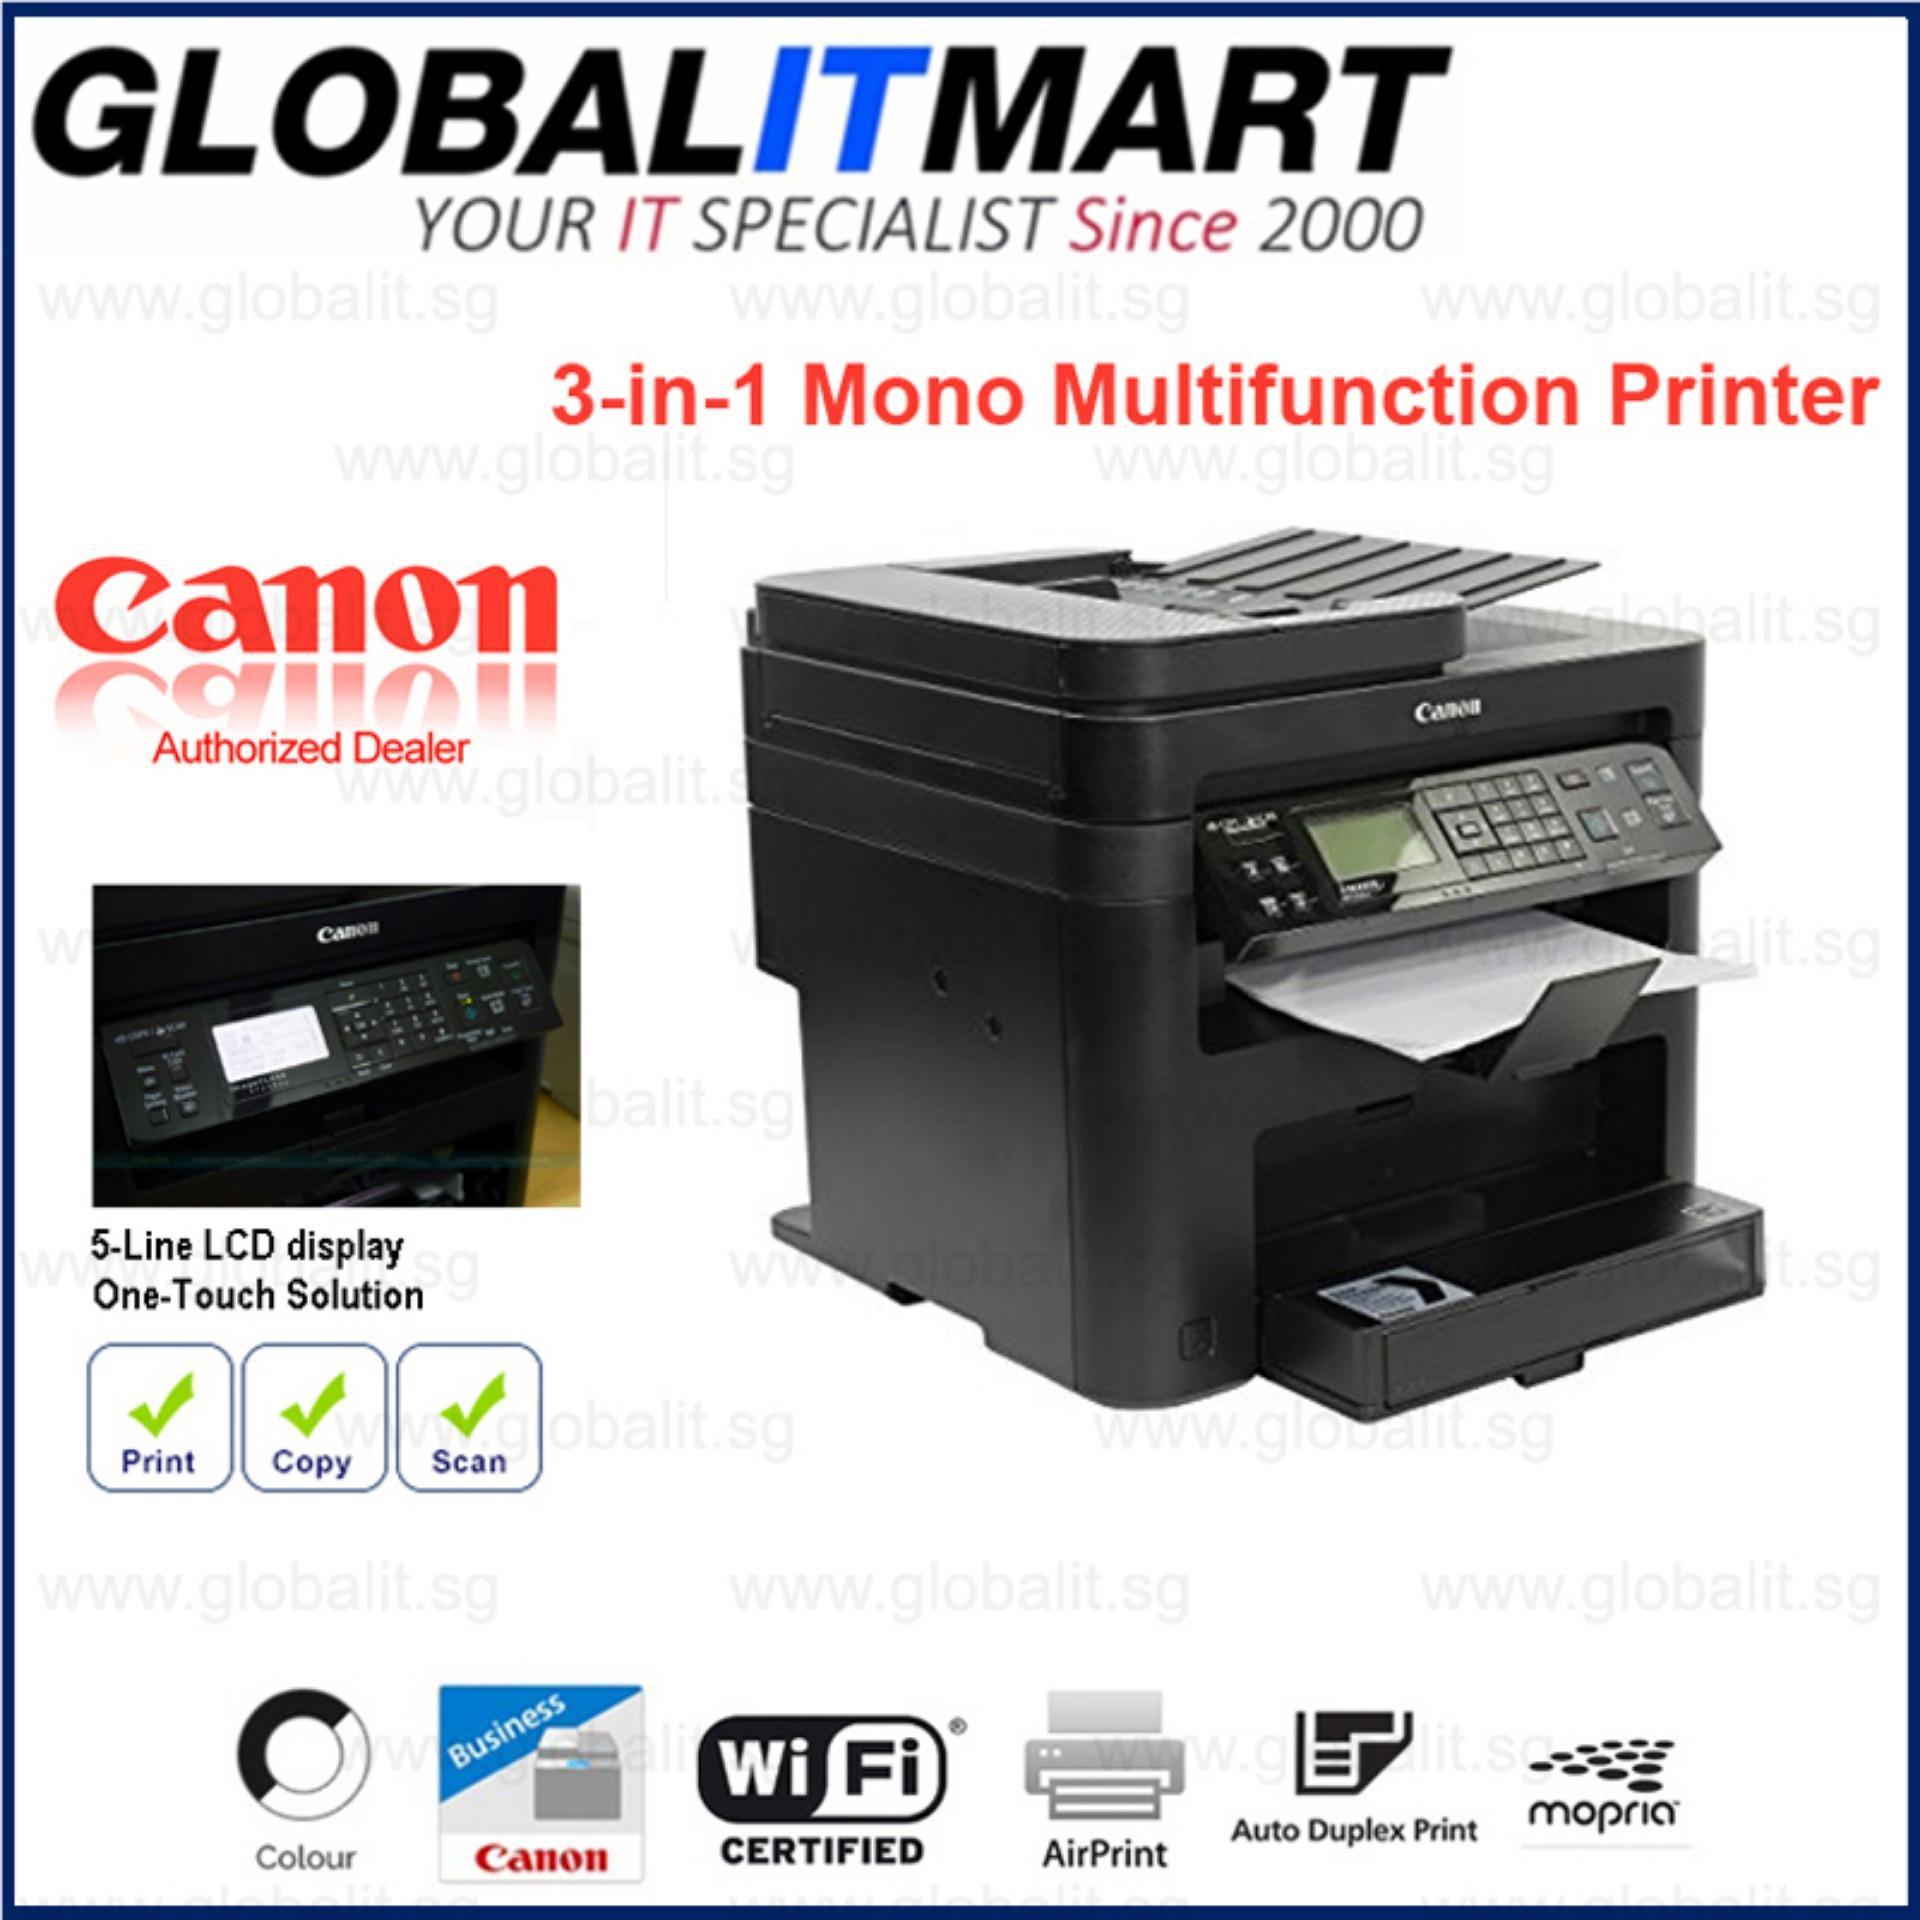 Cheap Canon Imageclass Mf244Dw 3 In 1 Mono Multifunction Printer Online